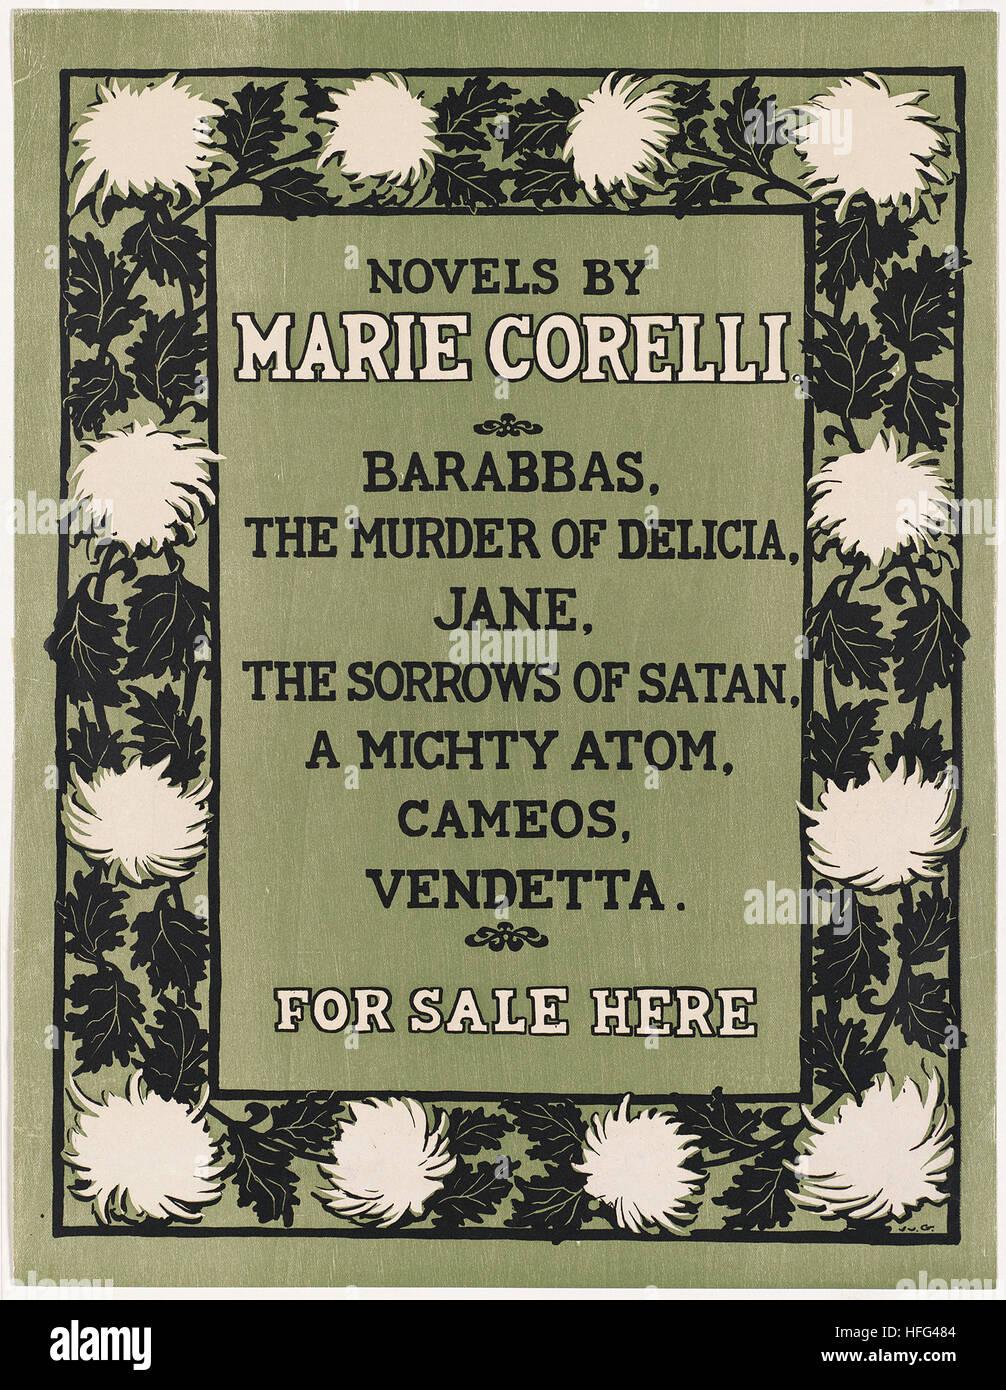 Novels by Marie Corelli - Stock Image